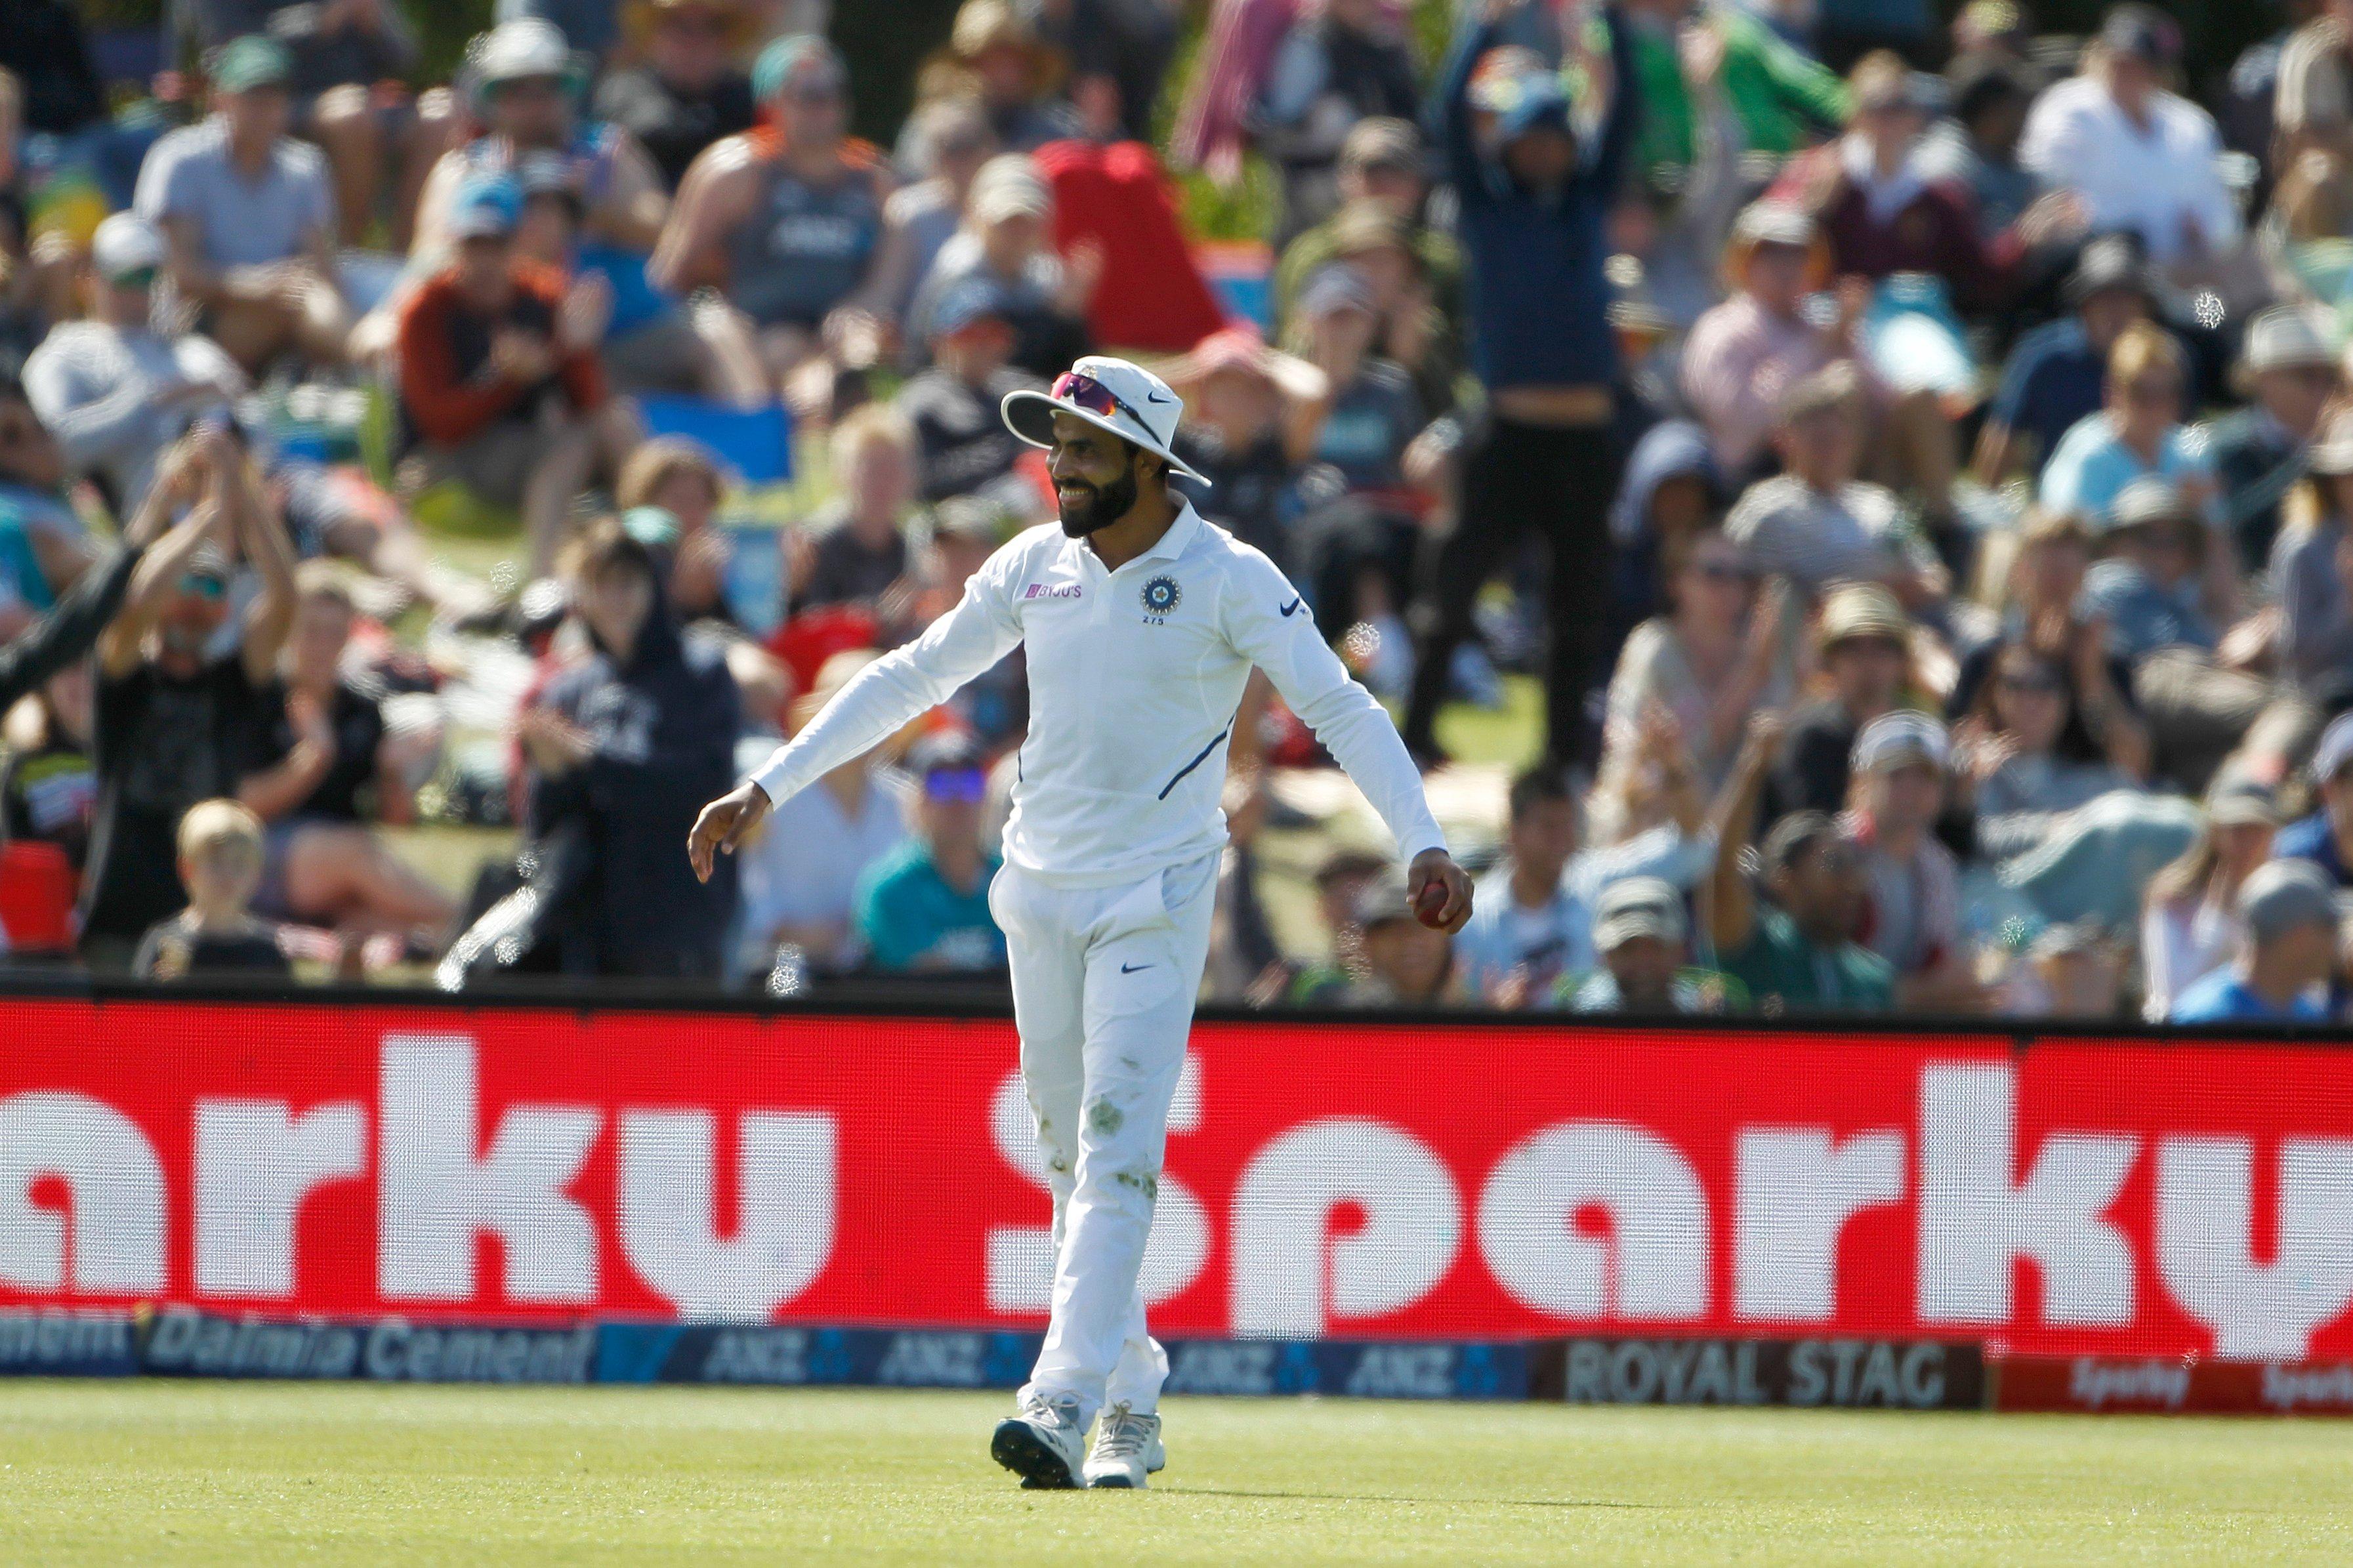 India vs New Zealand, India tour of New Zealand, Mohammad Shami, Jasprit Bumrah, Ajinkya Rahane, Virat Kohli, Cheteshwar Pujara, Ravindra Jadeja